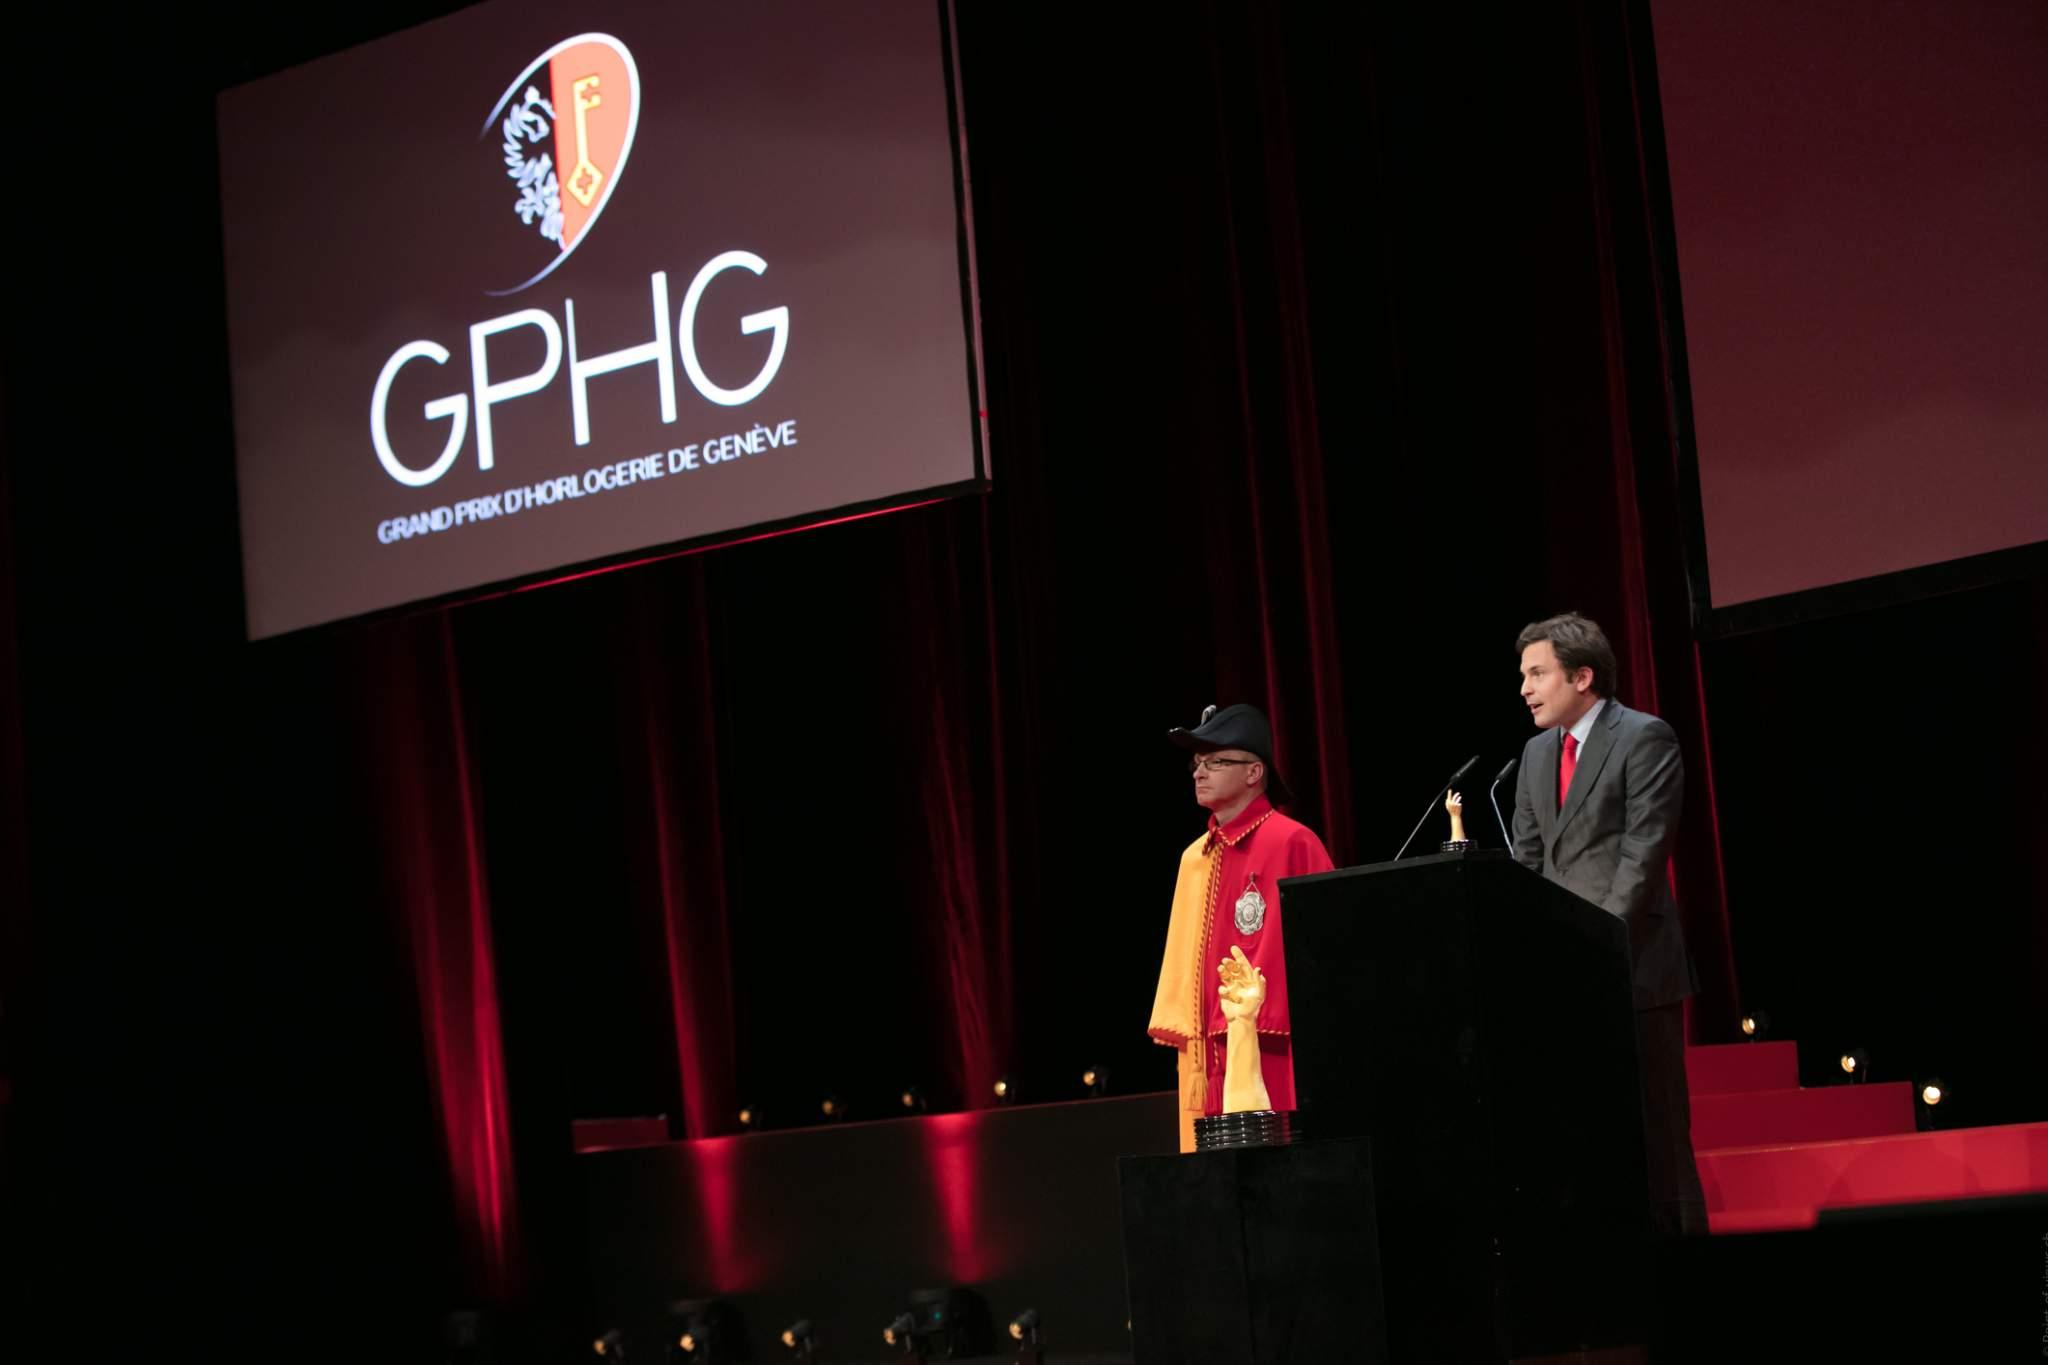 Guillaume Barazzone (Mayor of the City of Geneva)